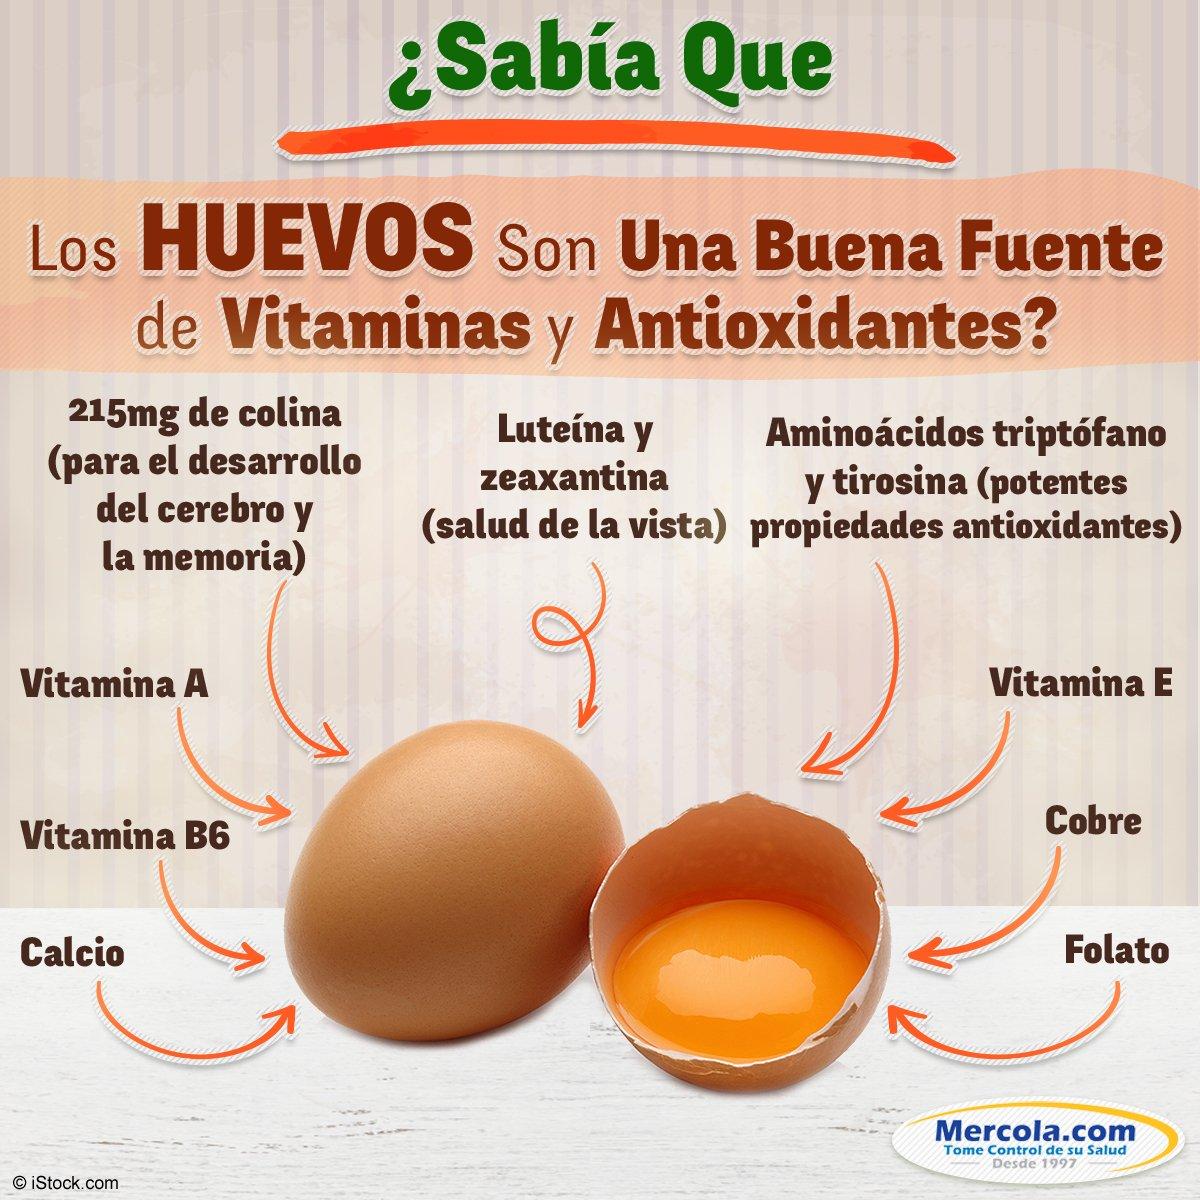 RT @mercola_espanol: #españolmercola #saludmercola #alimentossaludables #FelizMartes https://t.co/MkB4hIaE52